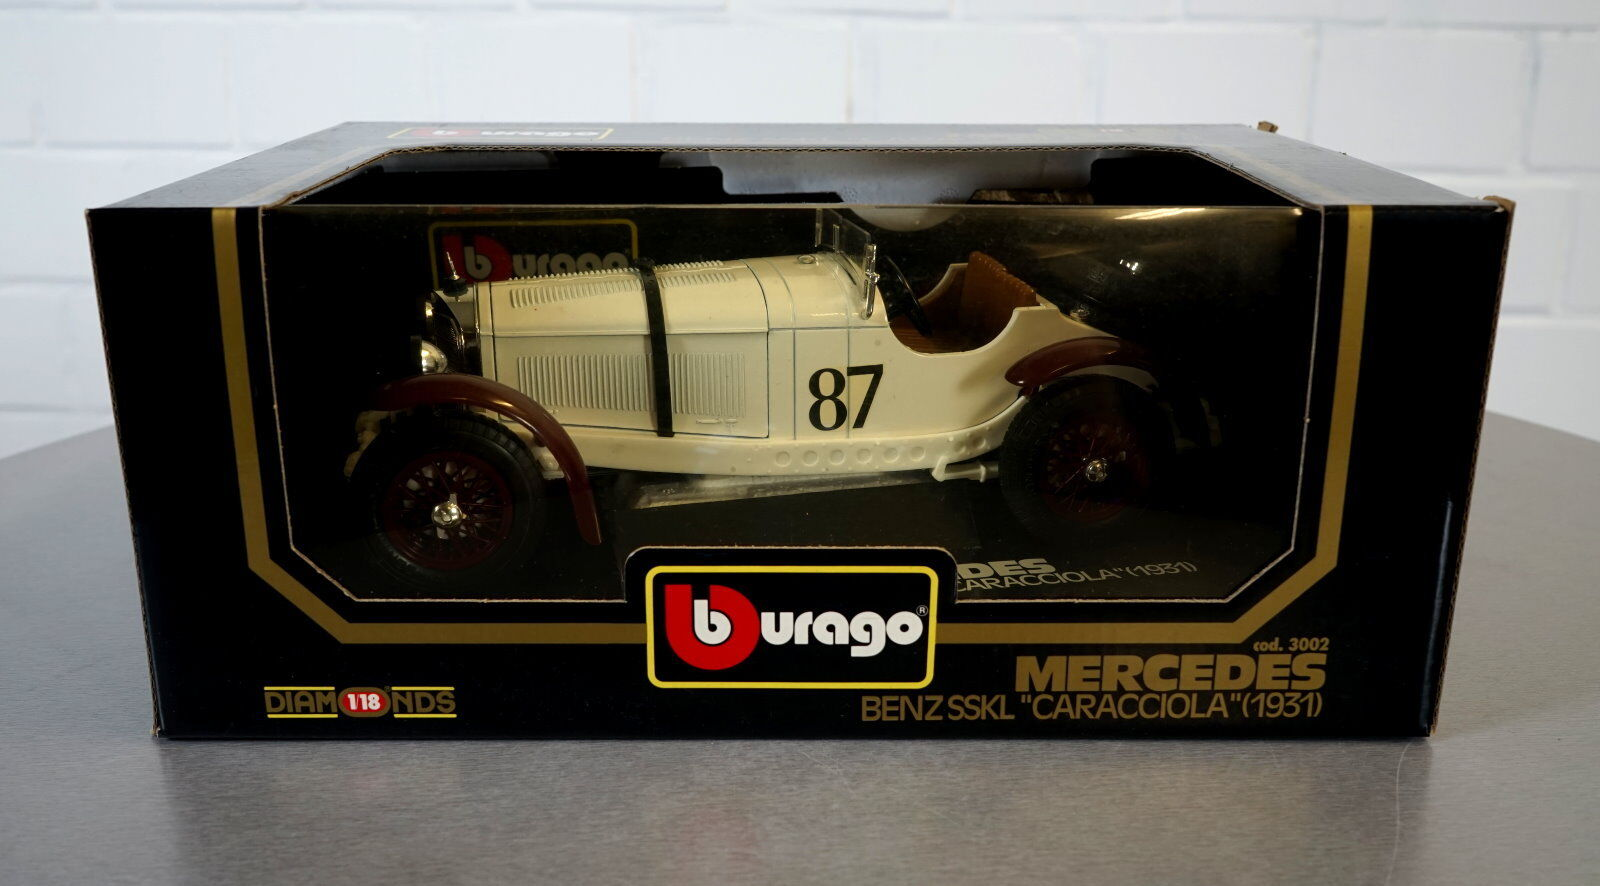 Burago Burago Burago 1 18 Mercedes Benz SSKL Caracciola (1931) -3002- Die-Cast Modell Auto OVP  | Toy Story  b348a4